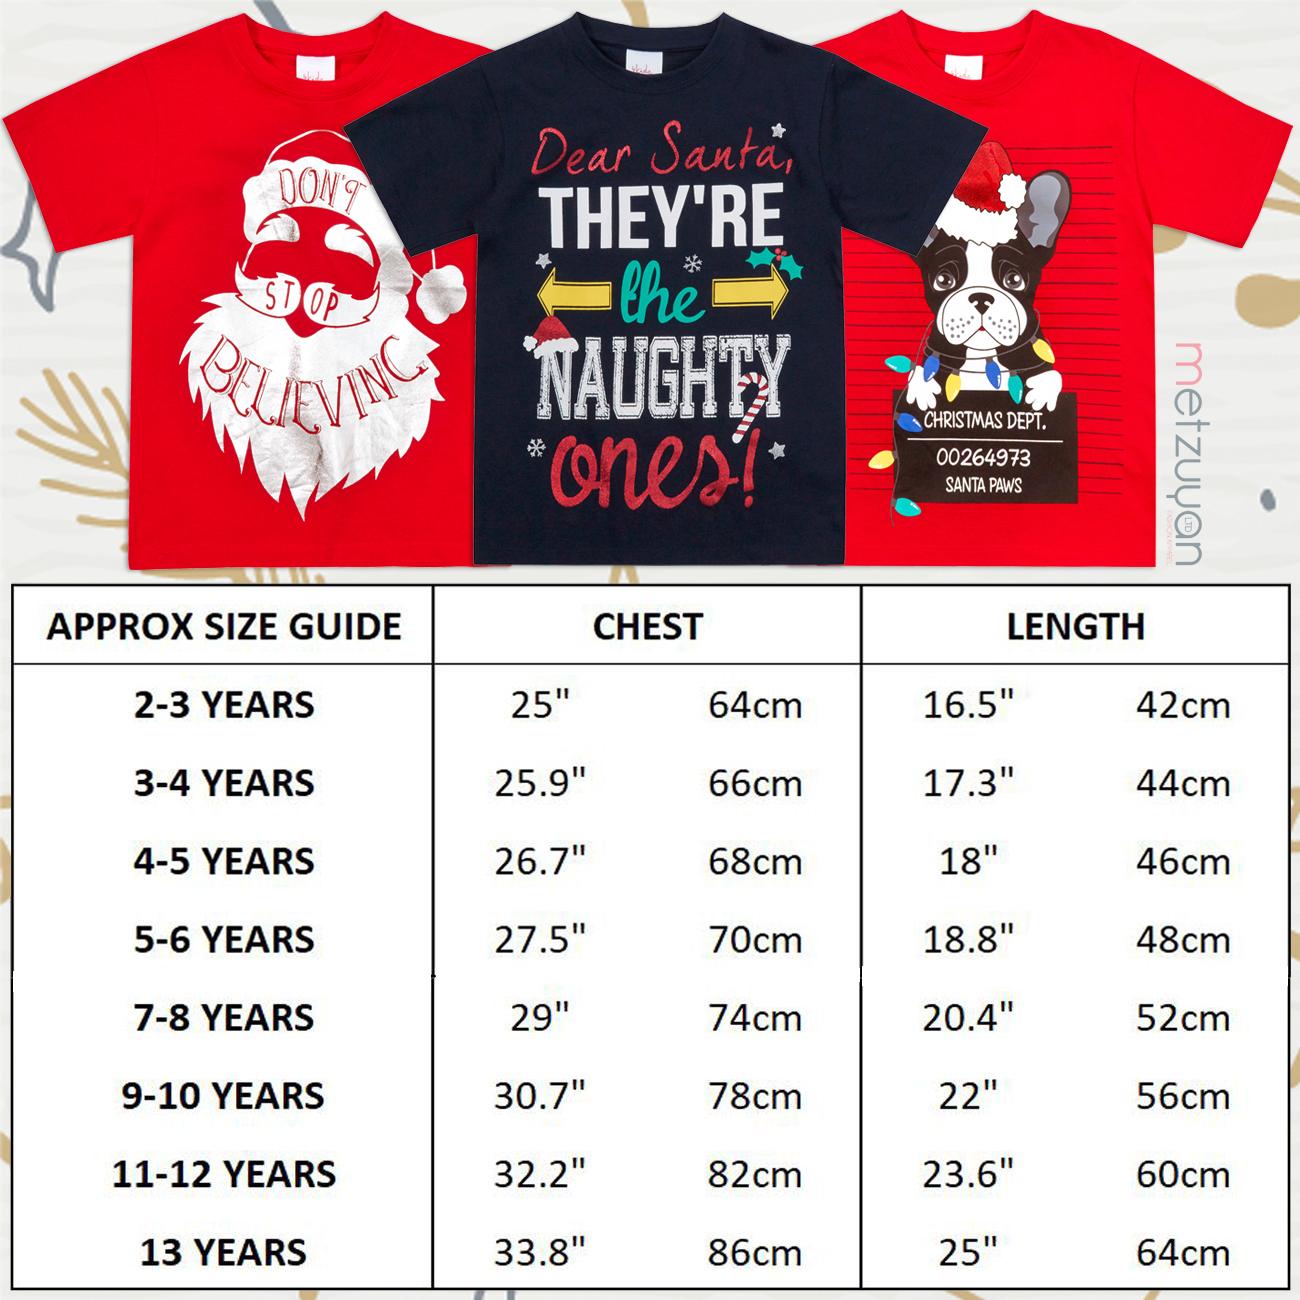 Childrens-Girls-Boys-Xmas-T-Shirts-Printed-Christmas-Design-100-Cotton-2-13-Yrs thumbnail 5